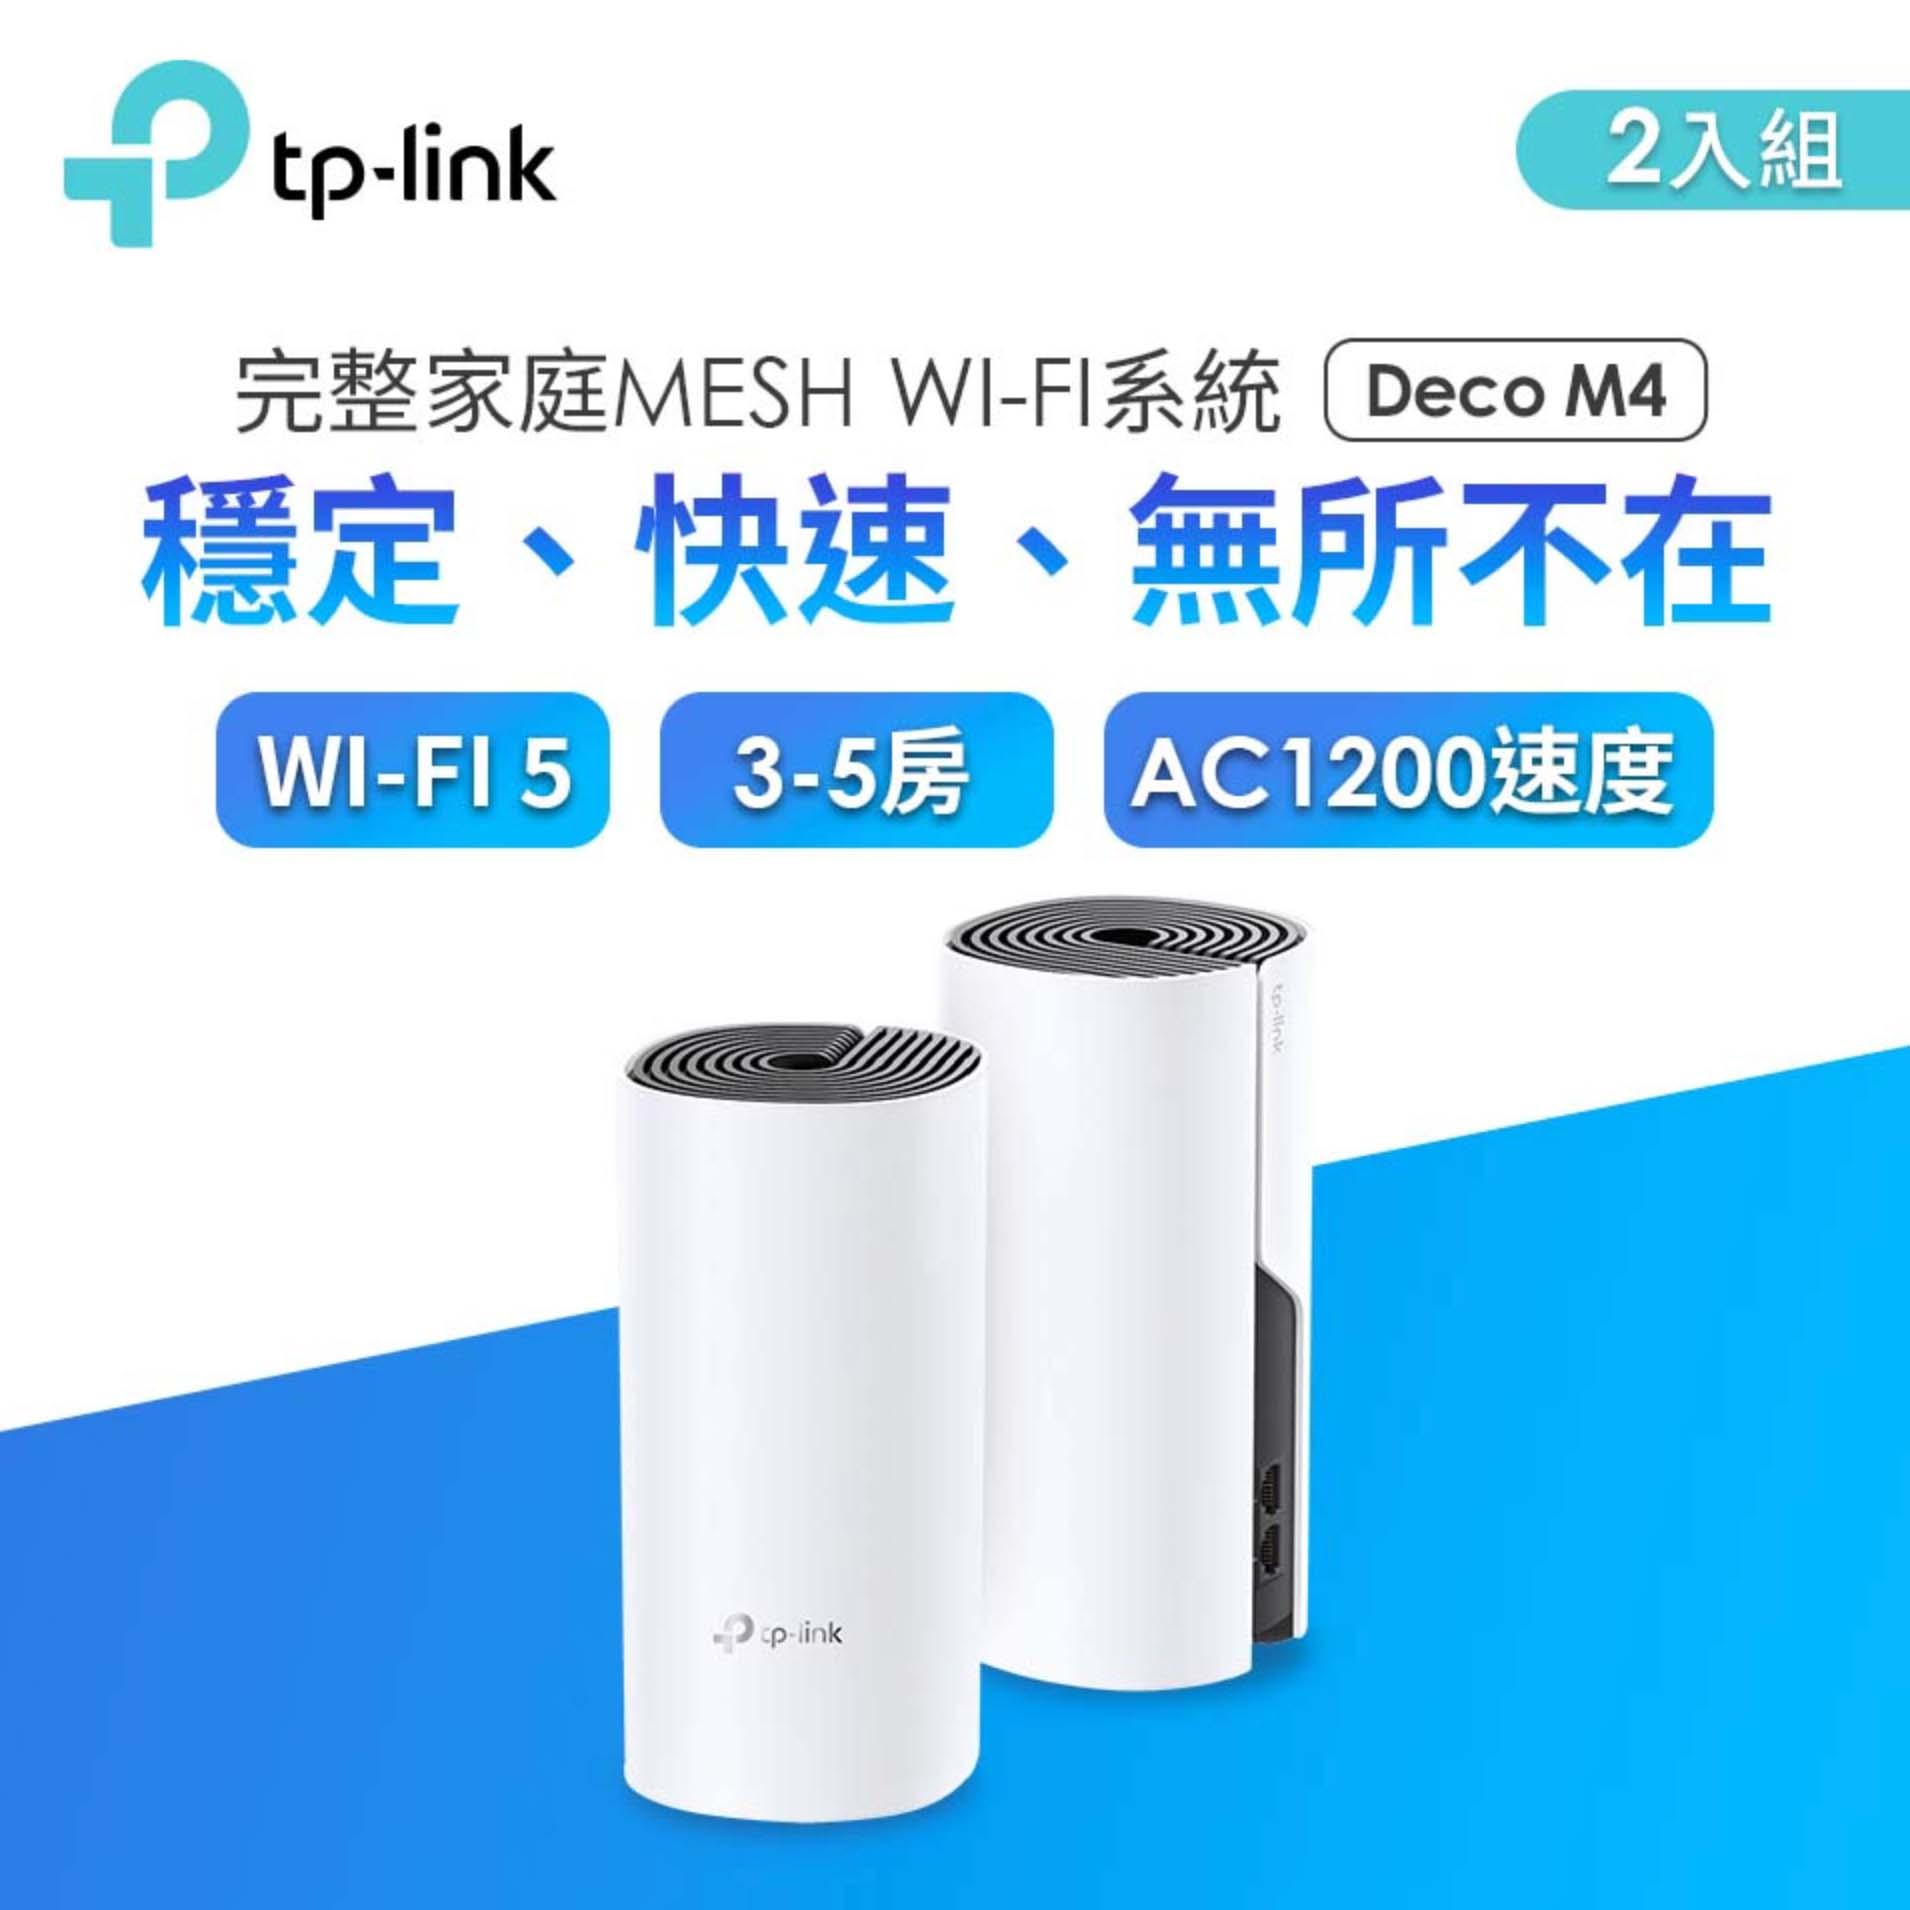 【2入組】TP-Link Deco M4 AC1200 完整家庭 Mesh Wi-Fi 系統 Deco M4(2-pack)